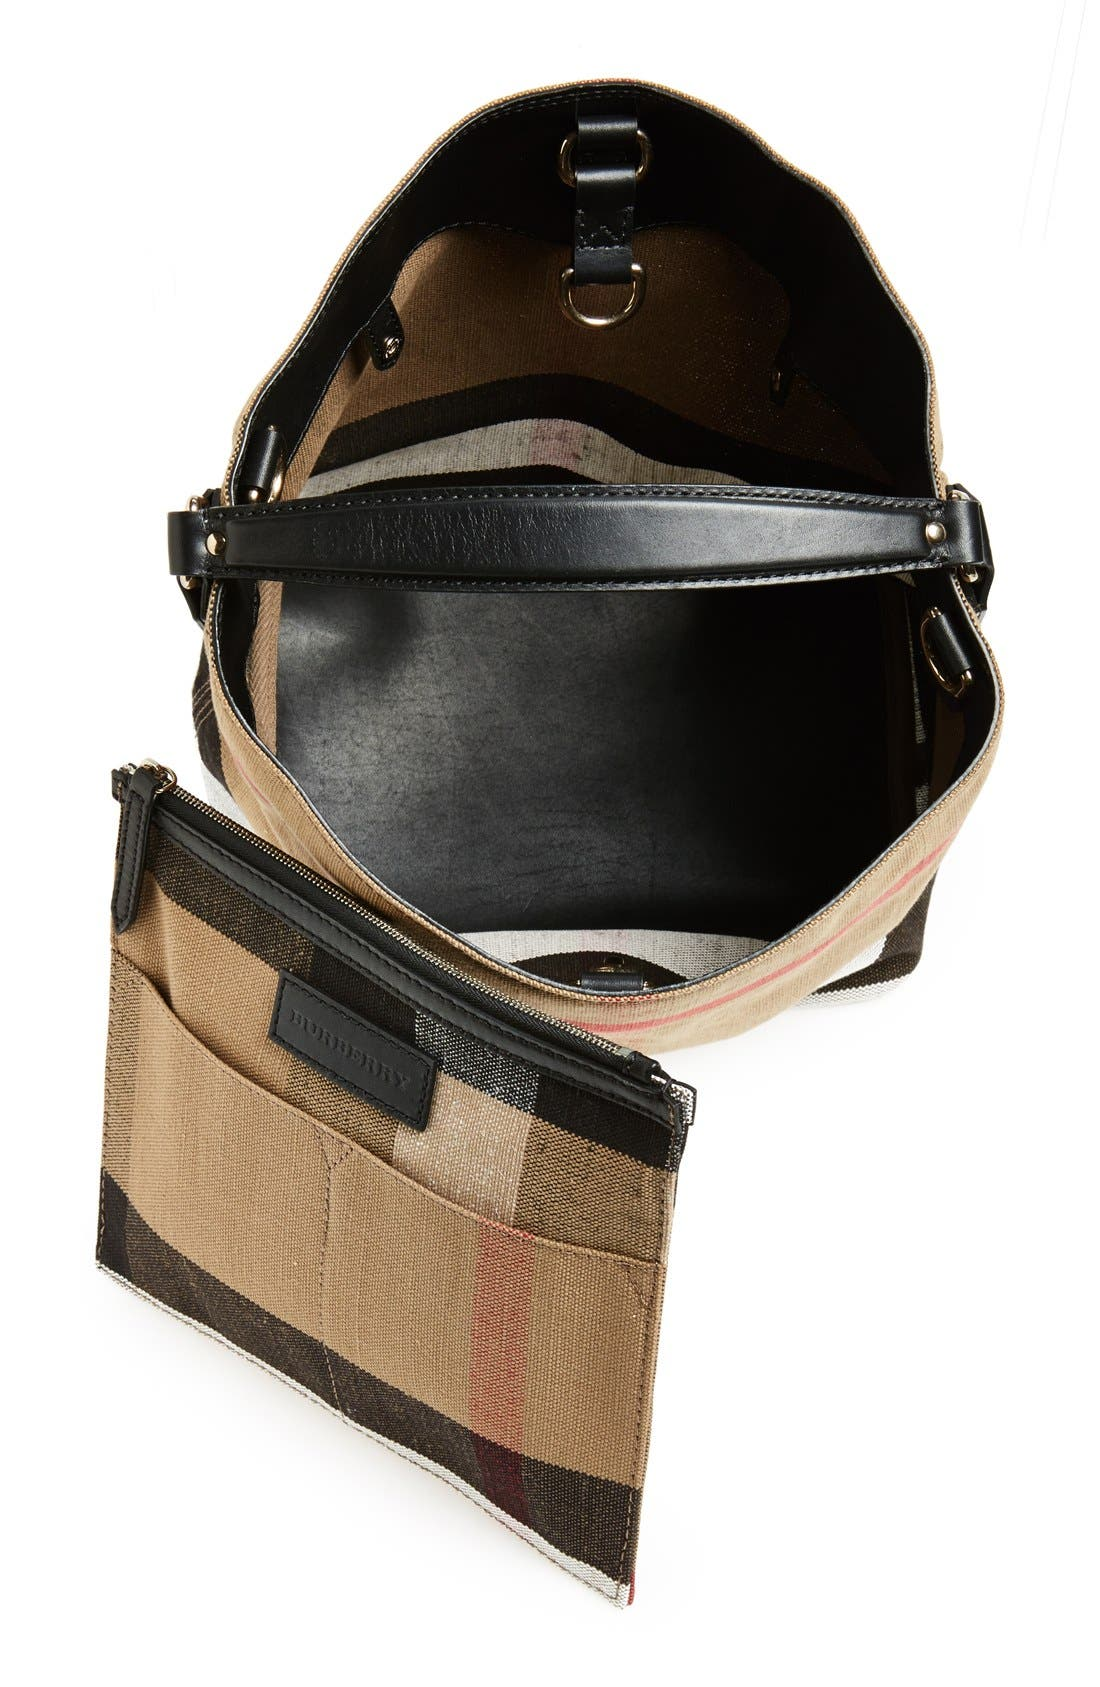 Medium Susanna Check Print Bucket Bag,                             Alternate thumbnail 3, color,                             Black